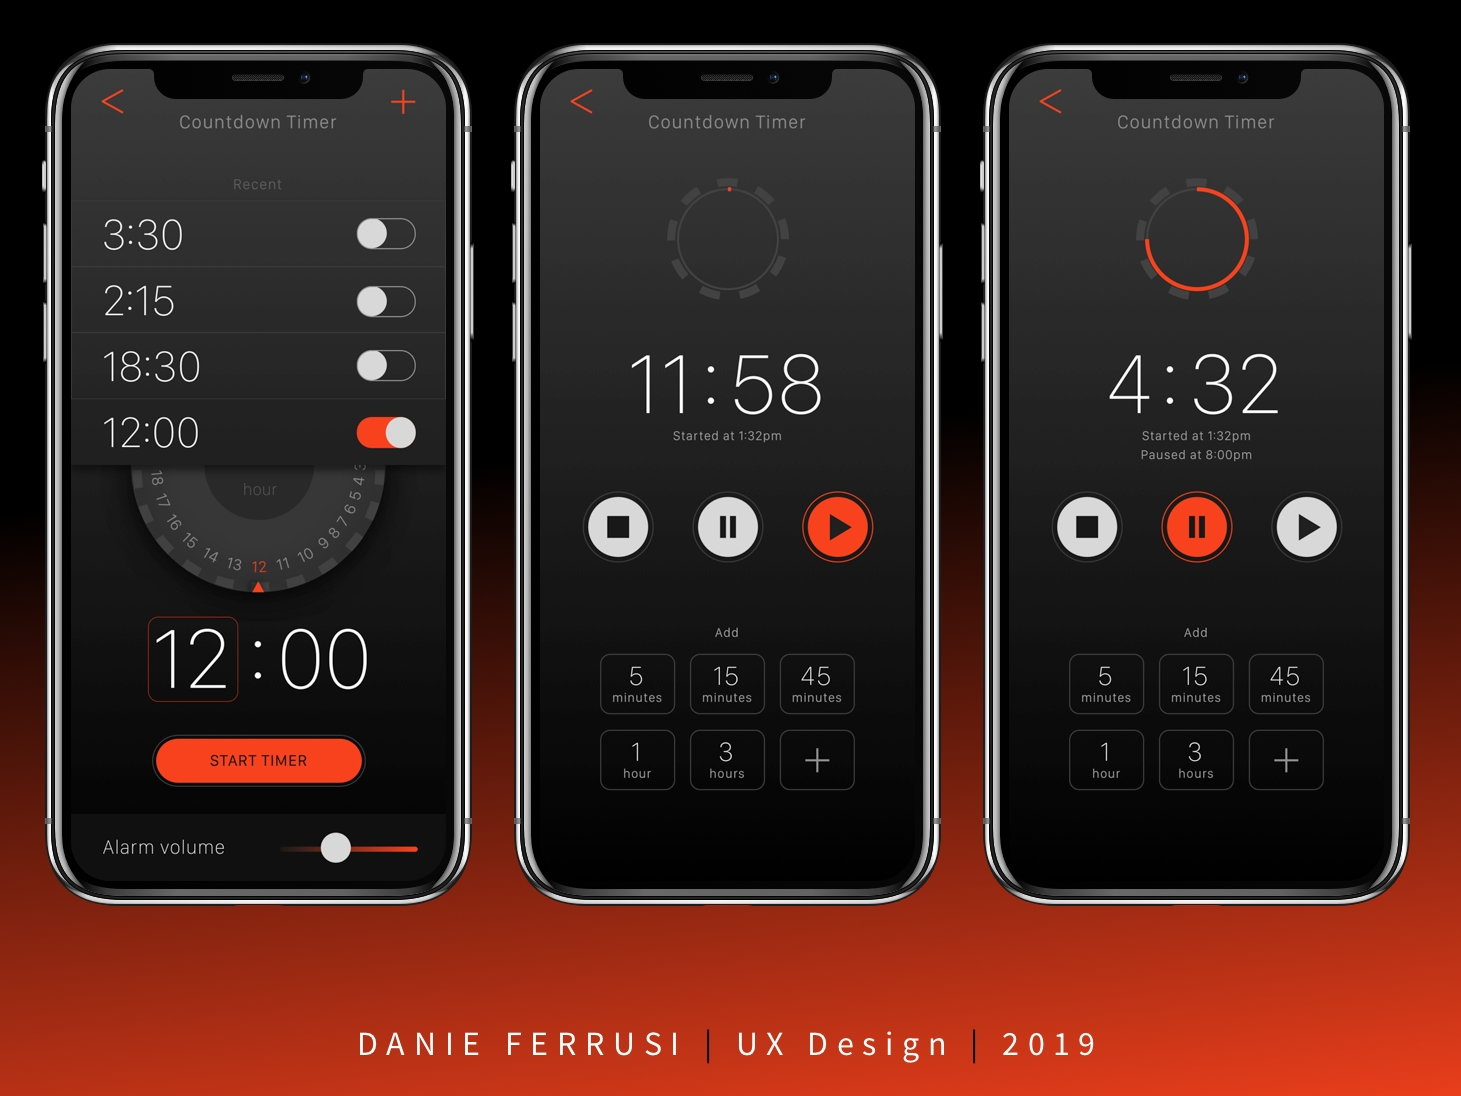 daily ui 014: countdown timerdanie ferrusi on dribbble